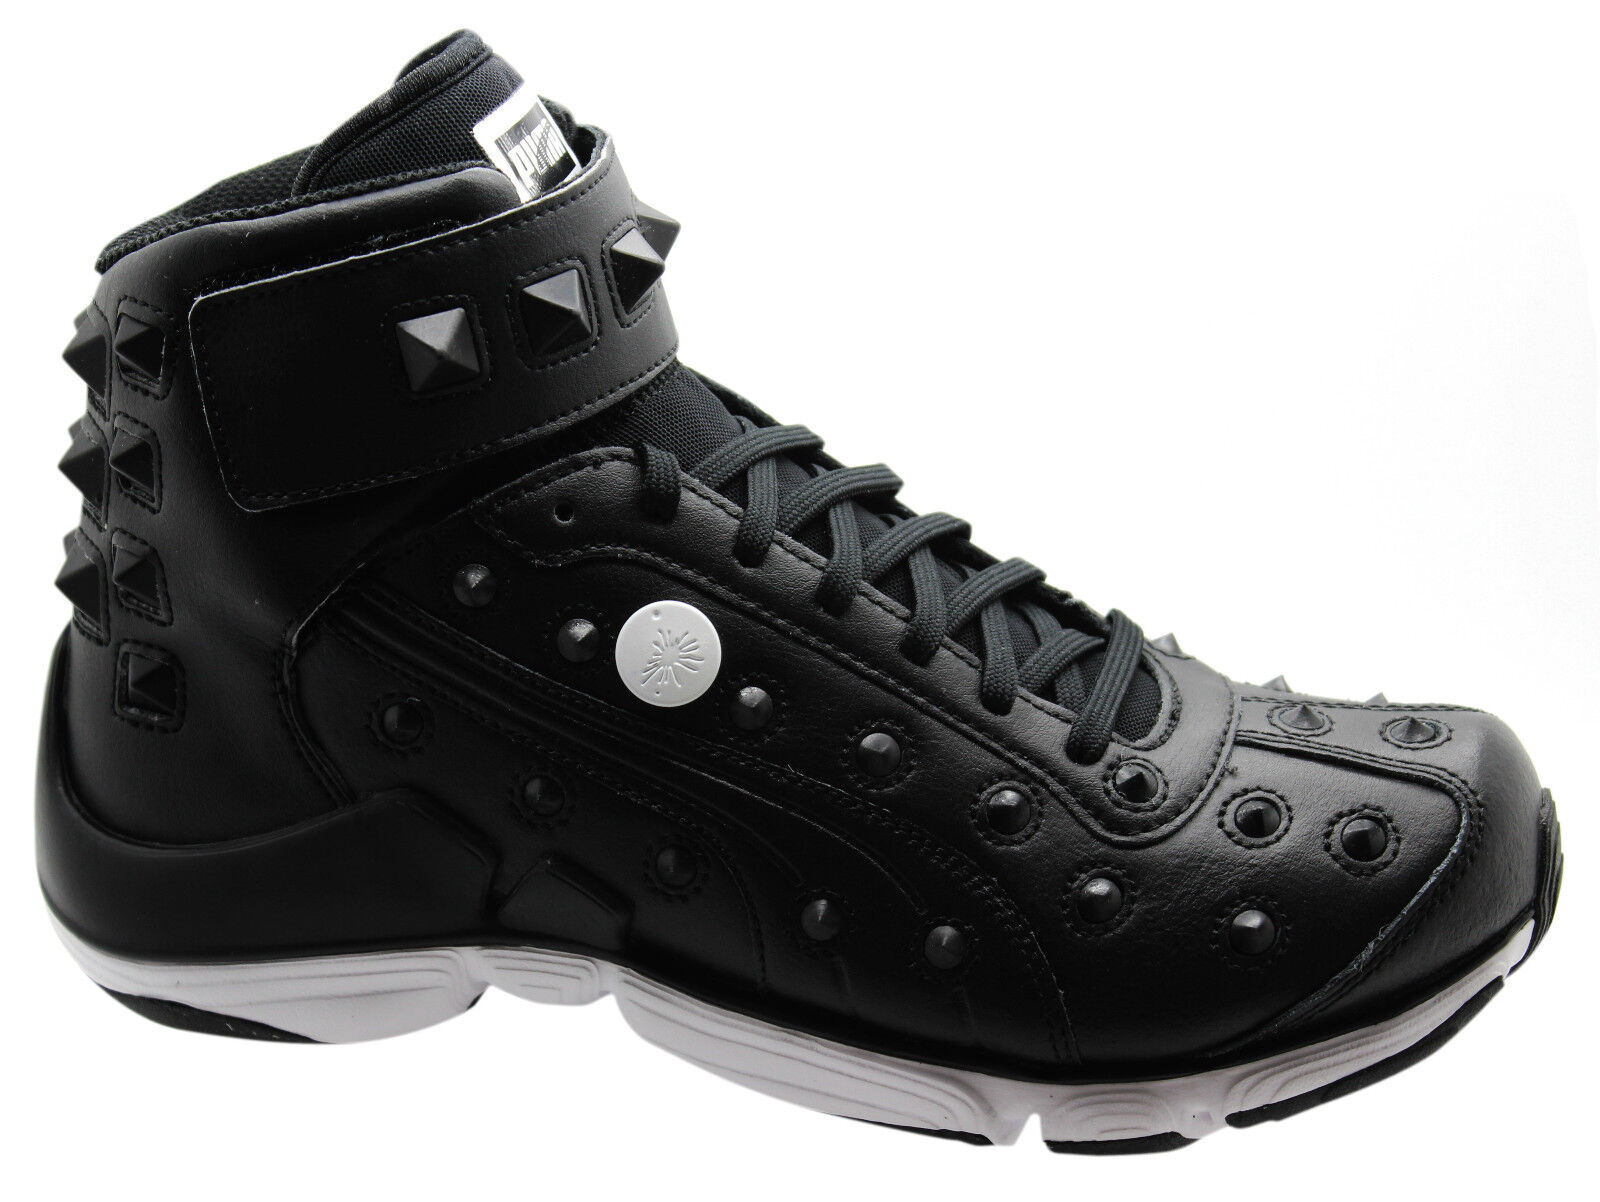 b5794c13214 Buy puma by miharayasuhiro sneakers